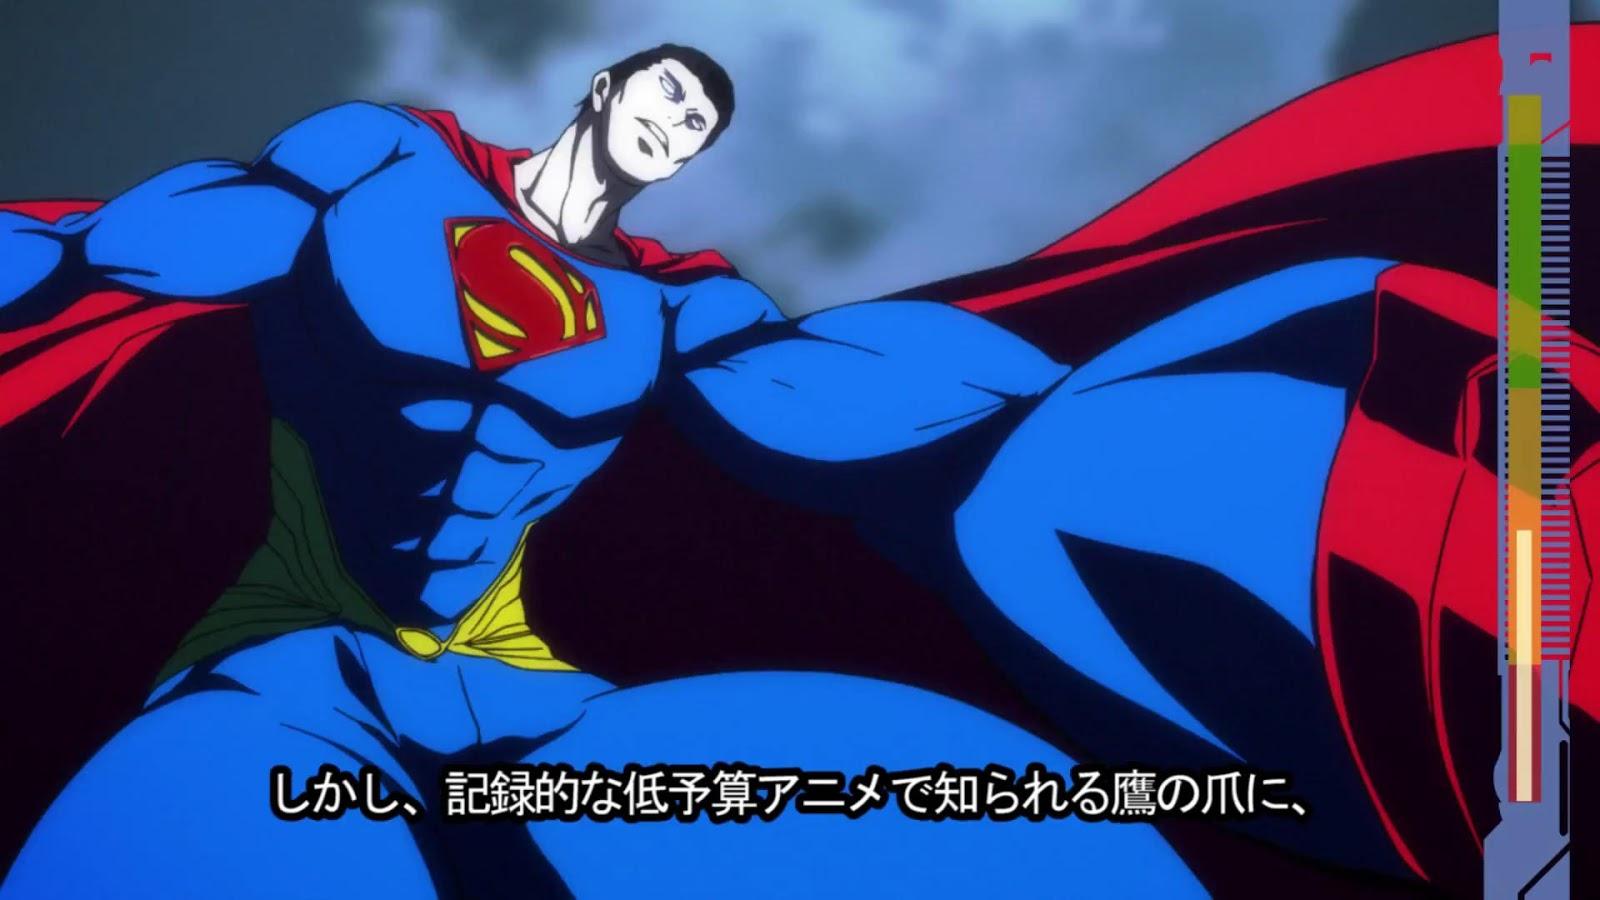 DC Super Heroes vs. Eagle Talon Comedy Anime Film Reveals  Batman, Harley Quinn And  Joker Voice Cast